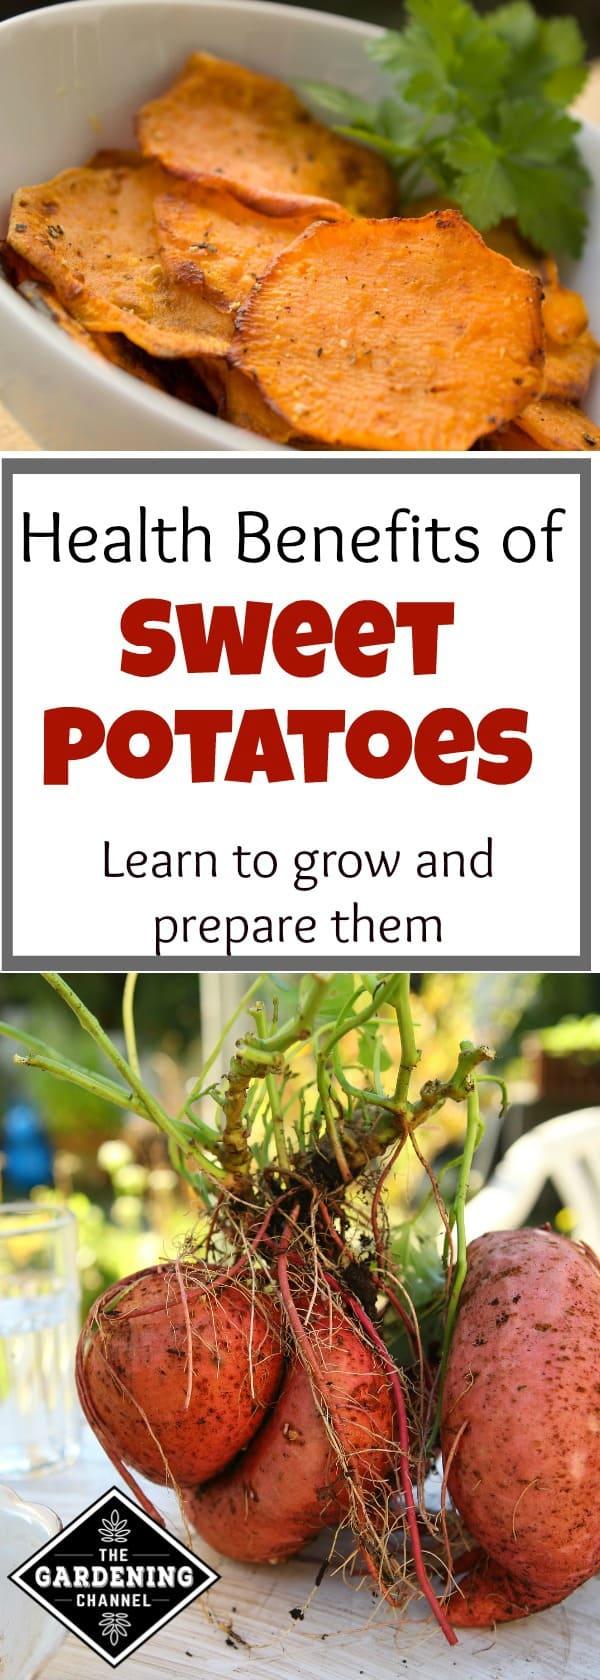 Health Benefits Of Sweet Potatoes Gardening Channel